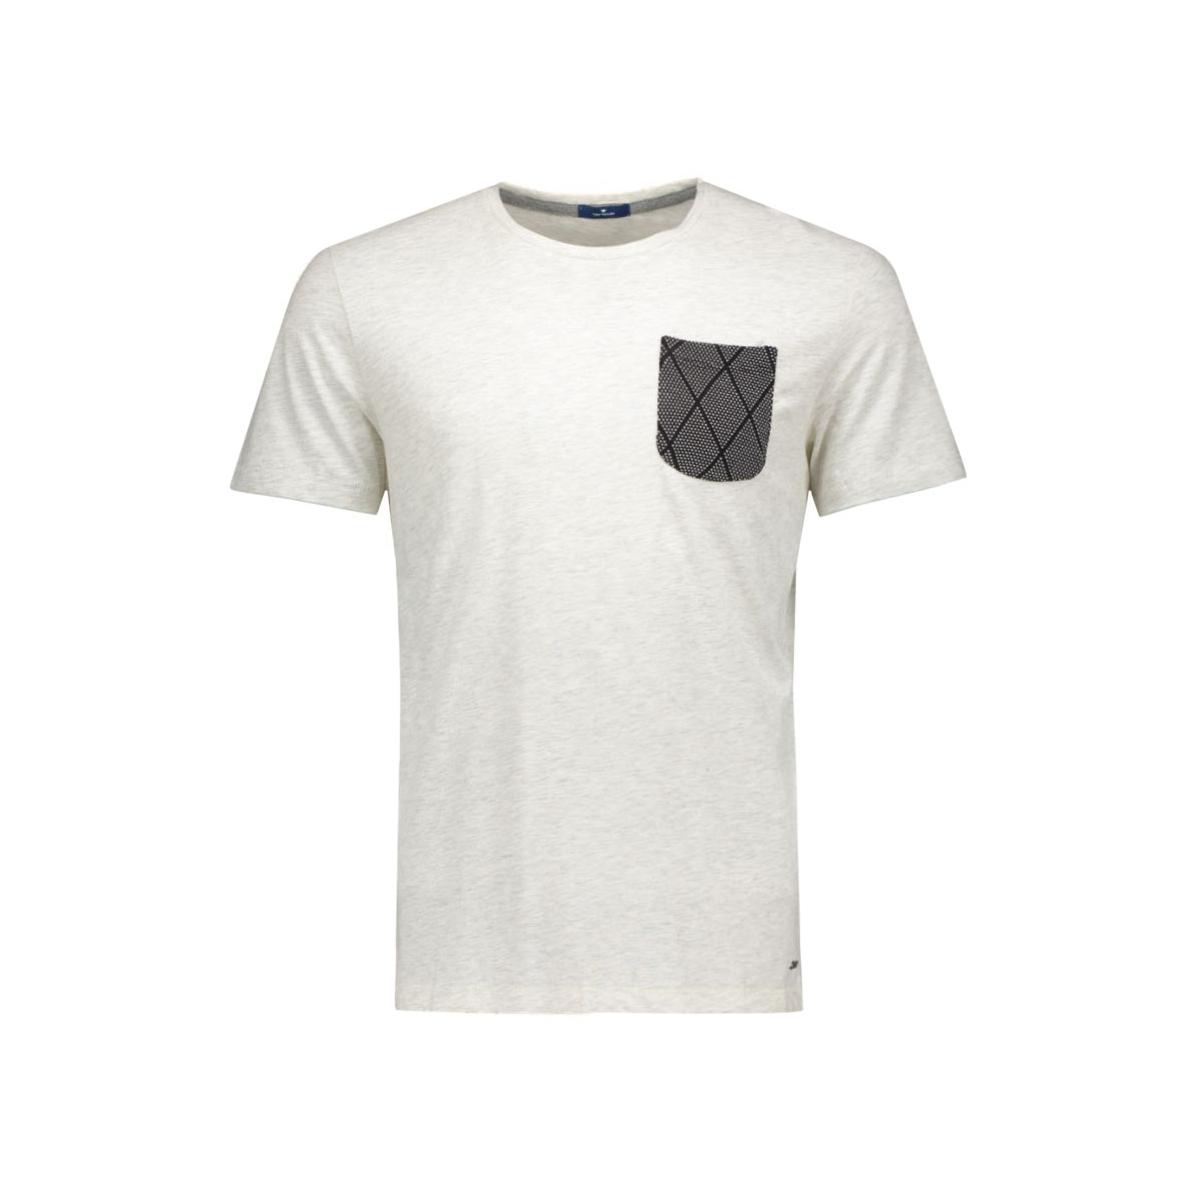 1035962.00.10 tom tailor t-shirt 2209